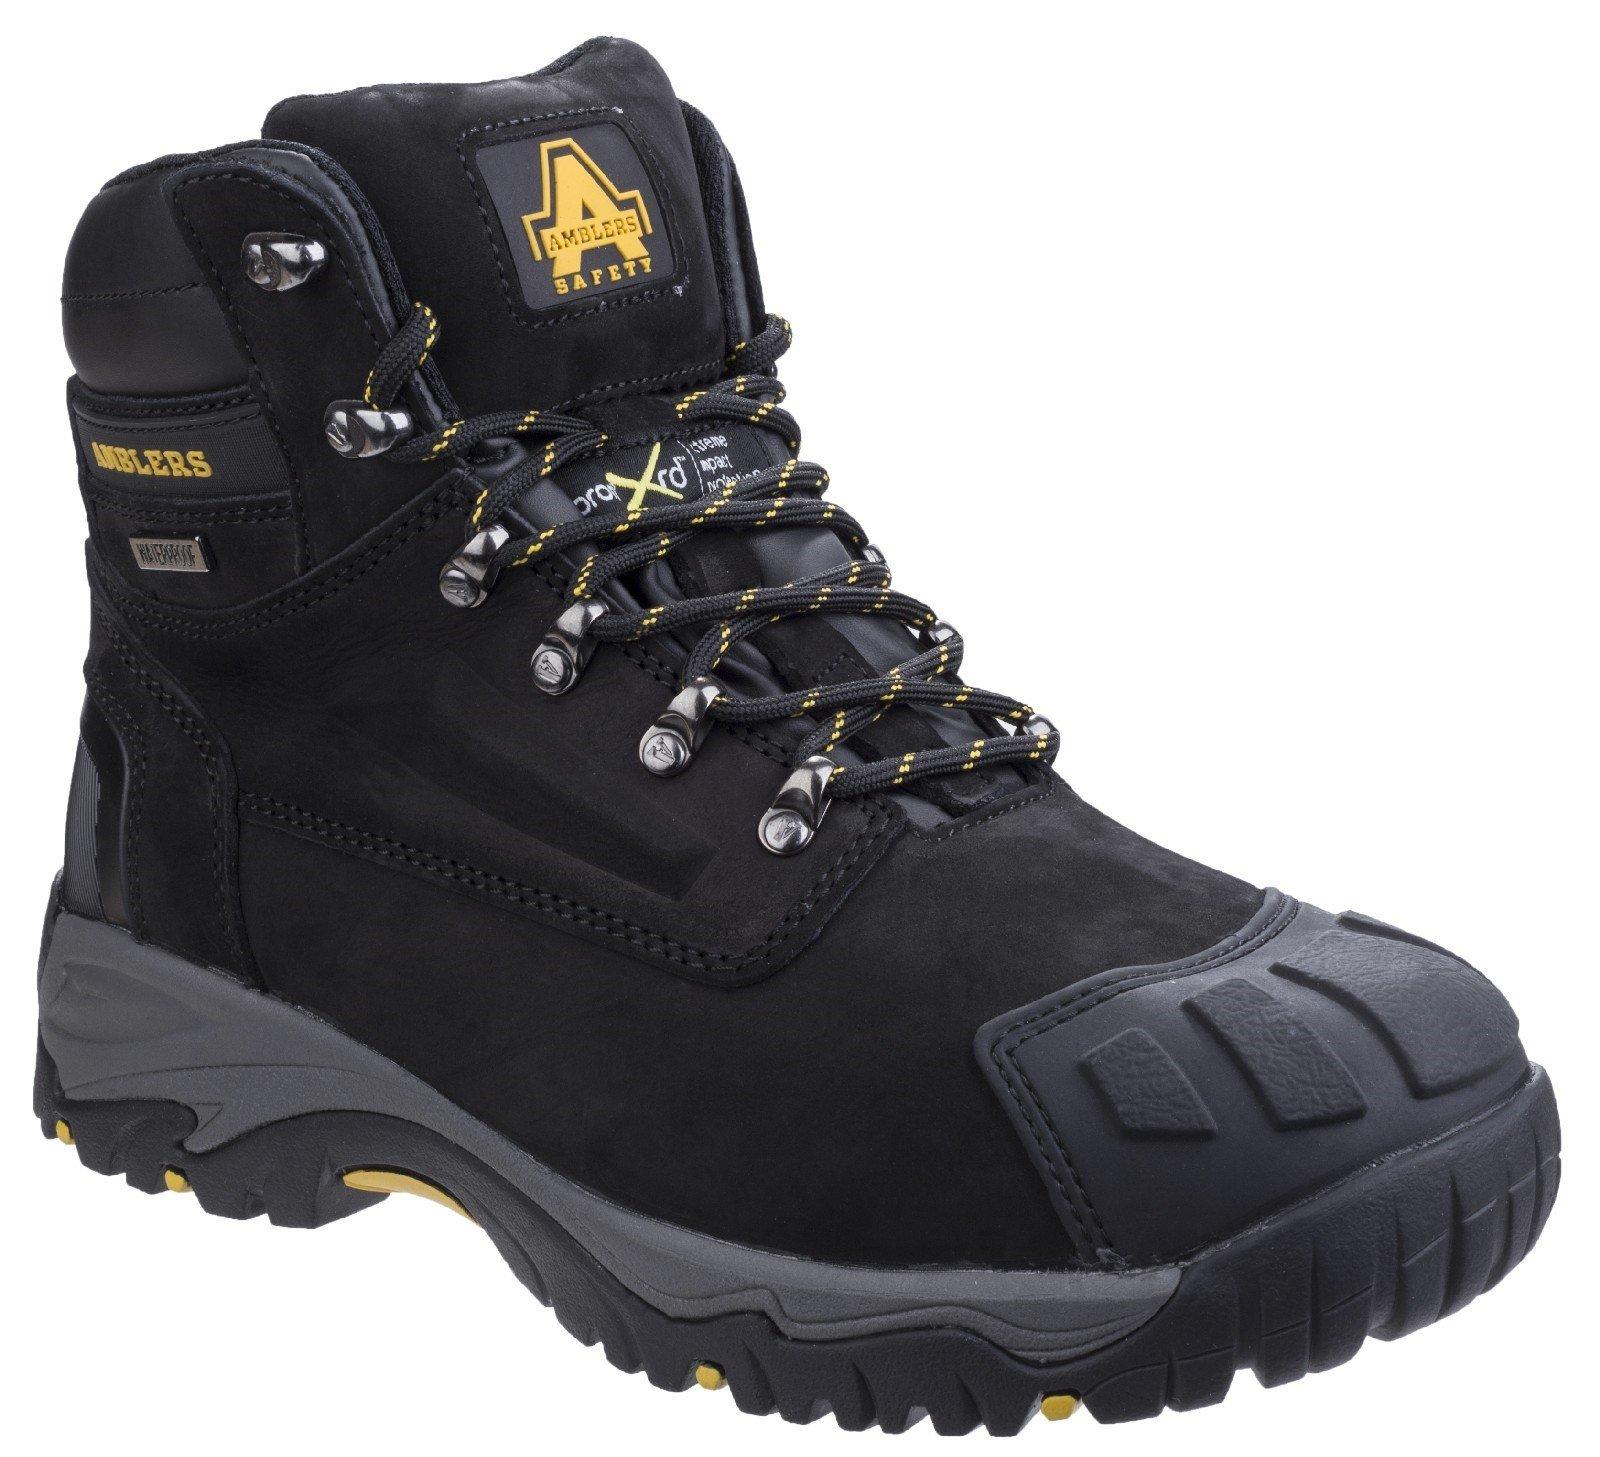 Amblers Unisex Safety Metatarsal Waterproof Lace Up Boot Black 20439 - Black 10